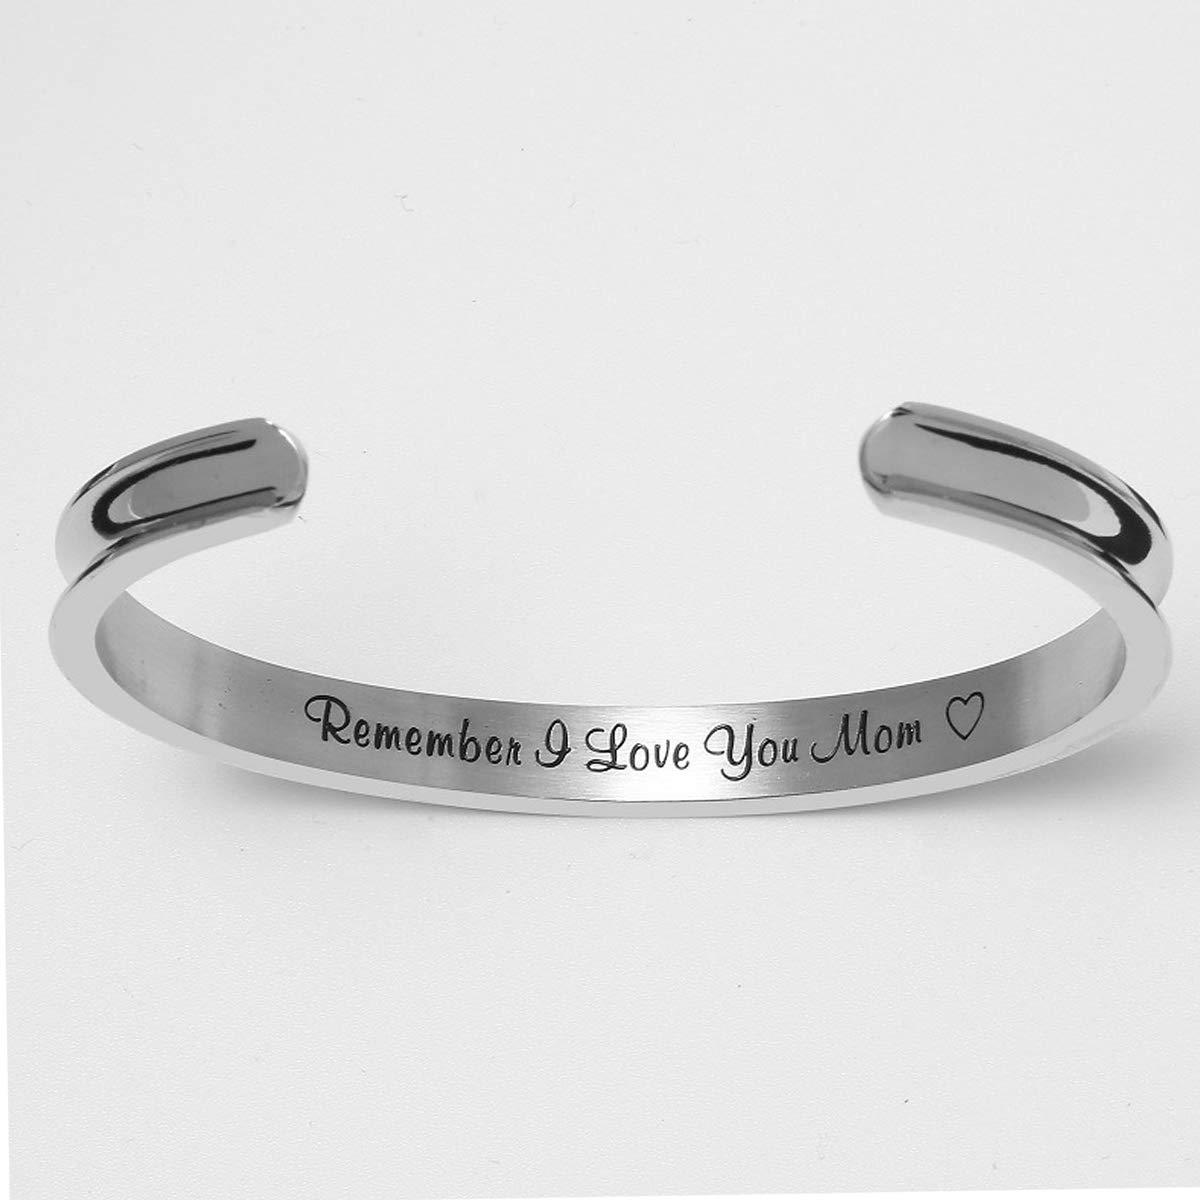 Vinca Mascot Cuff Bracelets Remember I Love You Mom Bangle Stainless Steel Engraved Women Jewelry for Mom Grandma